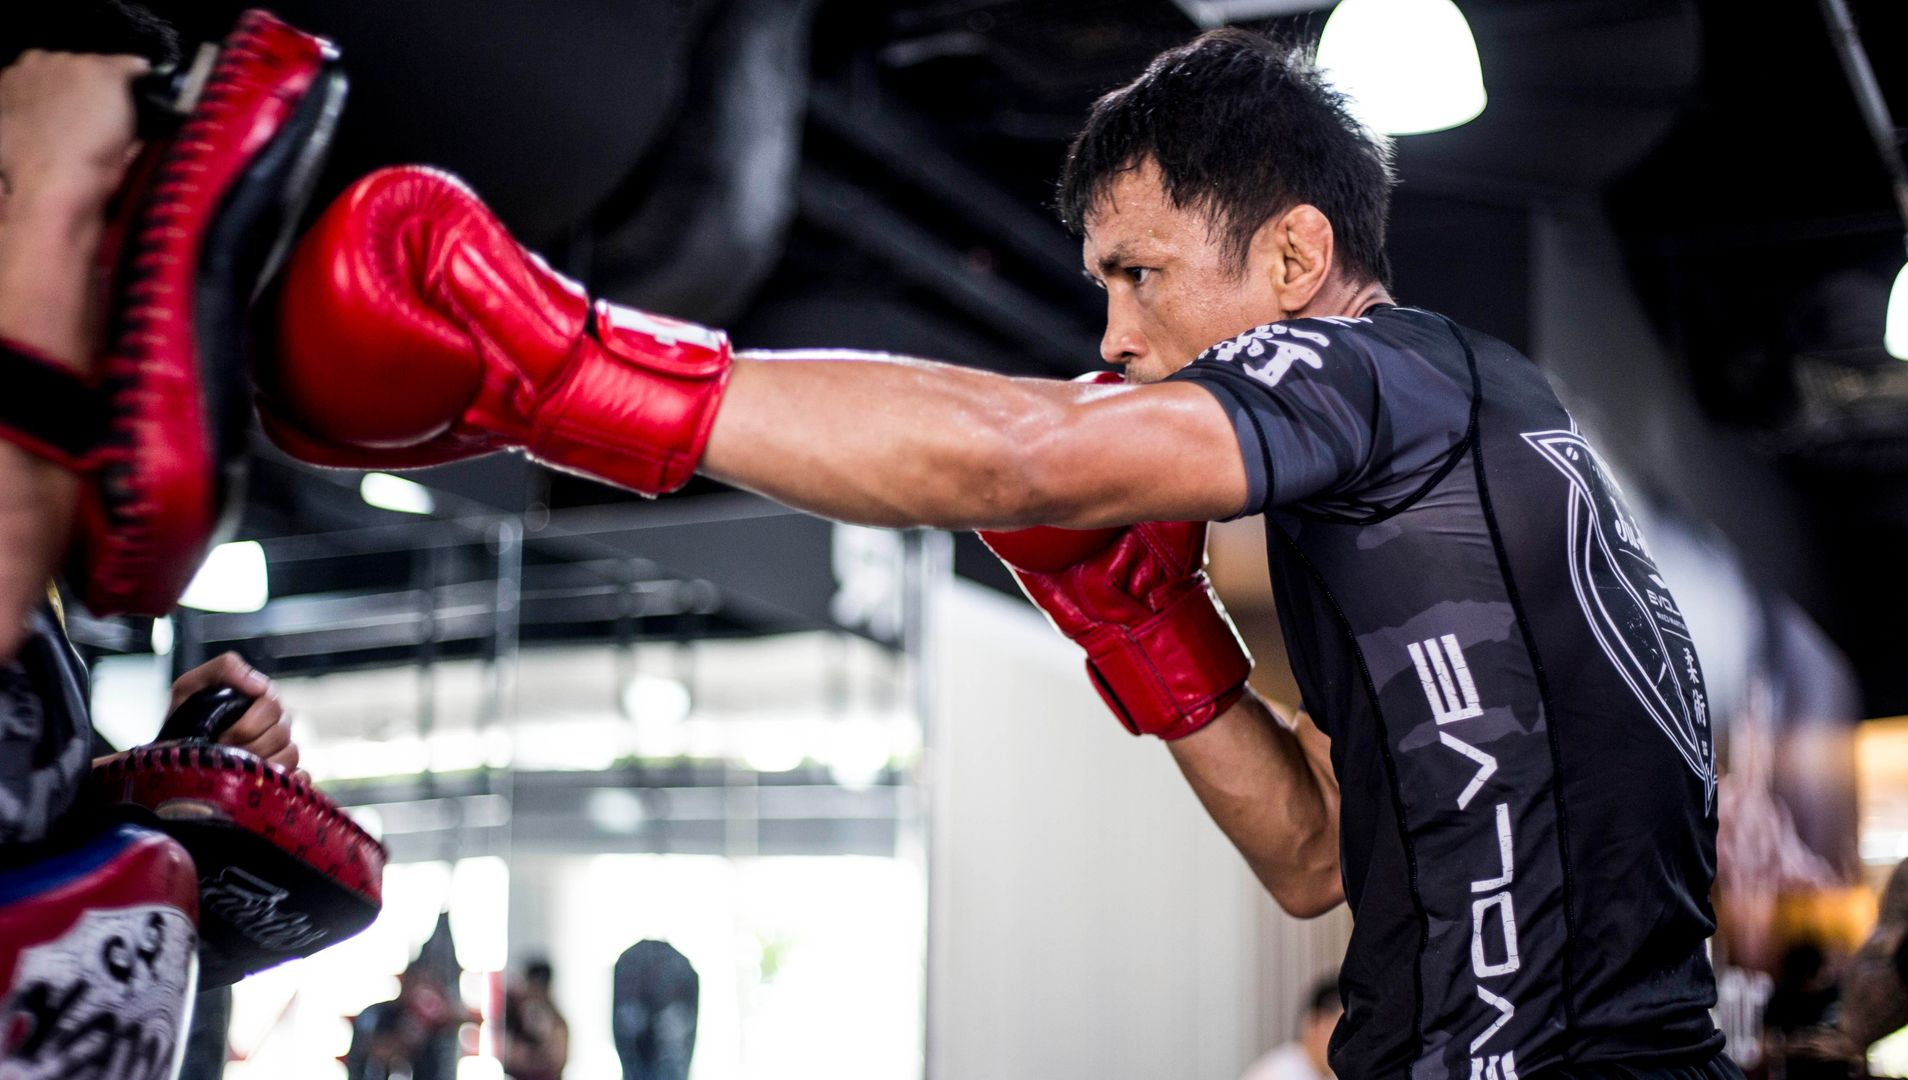 Muay-Thai-Exercises